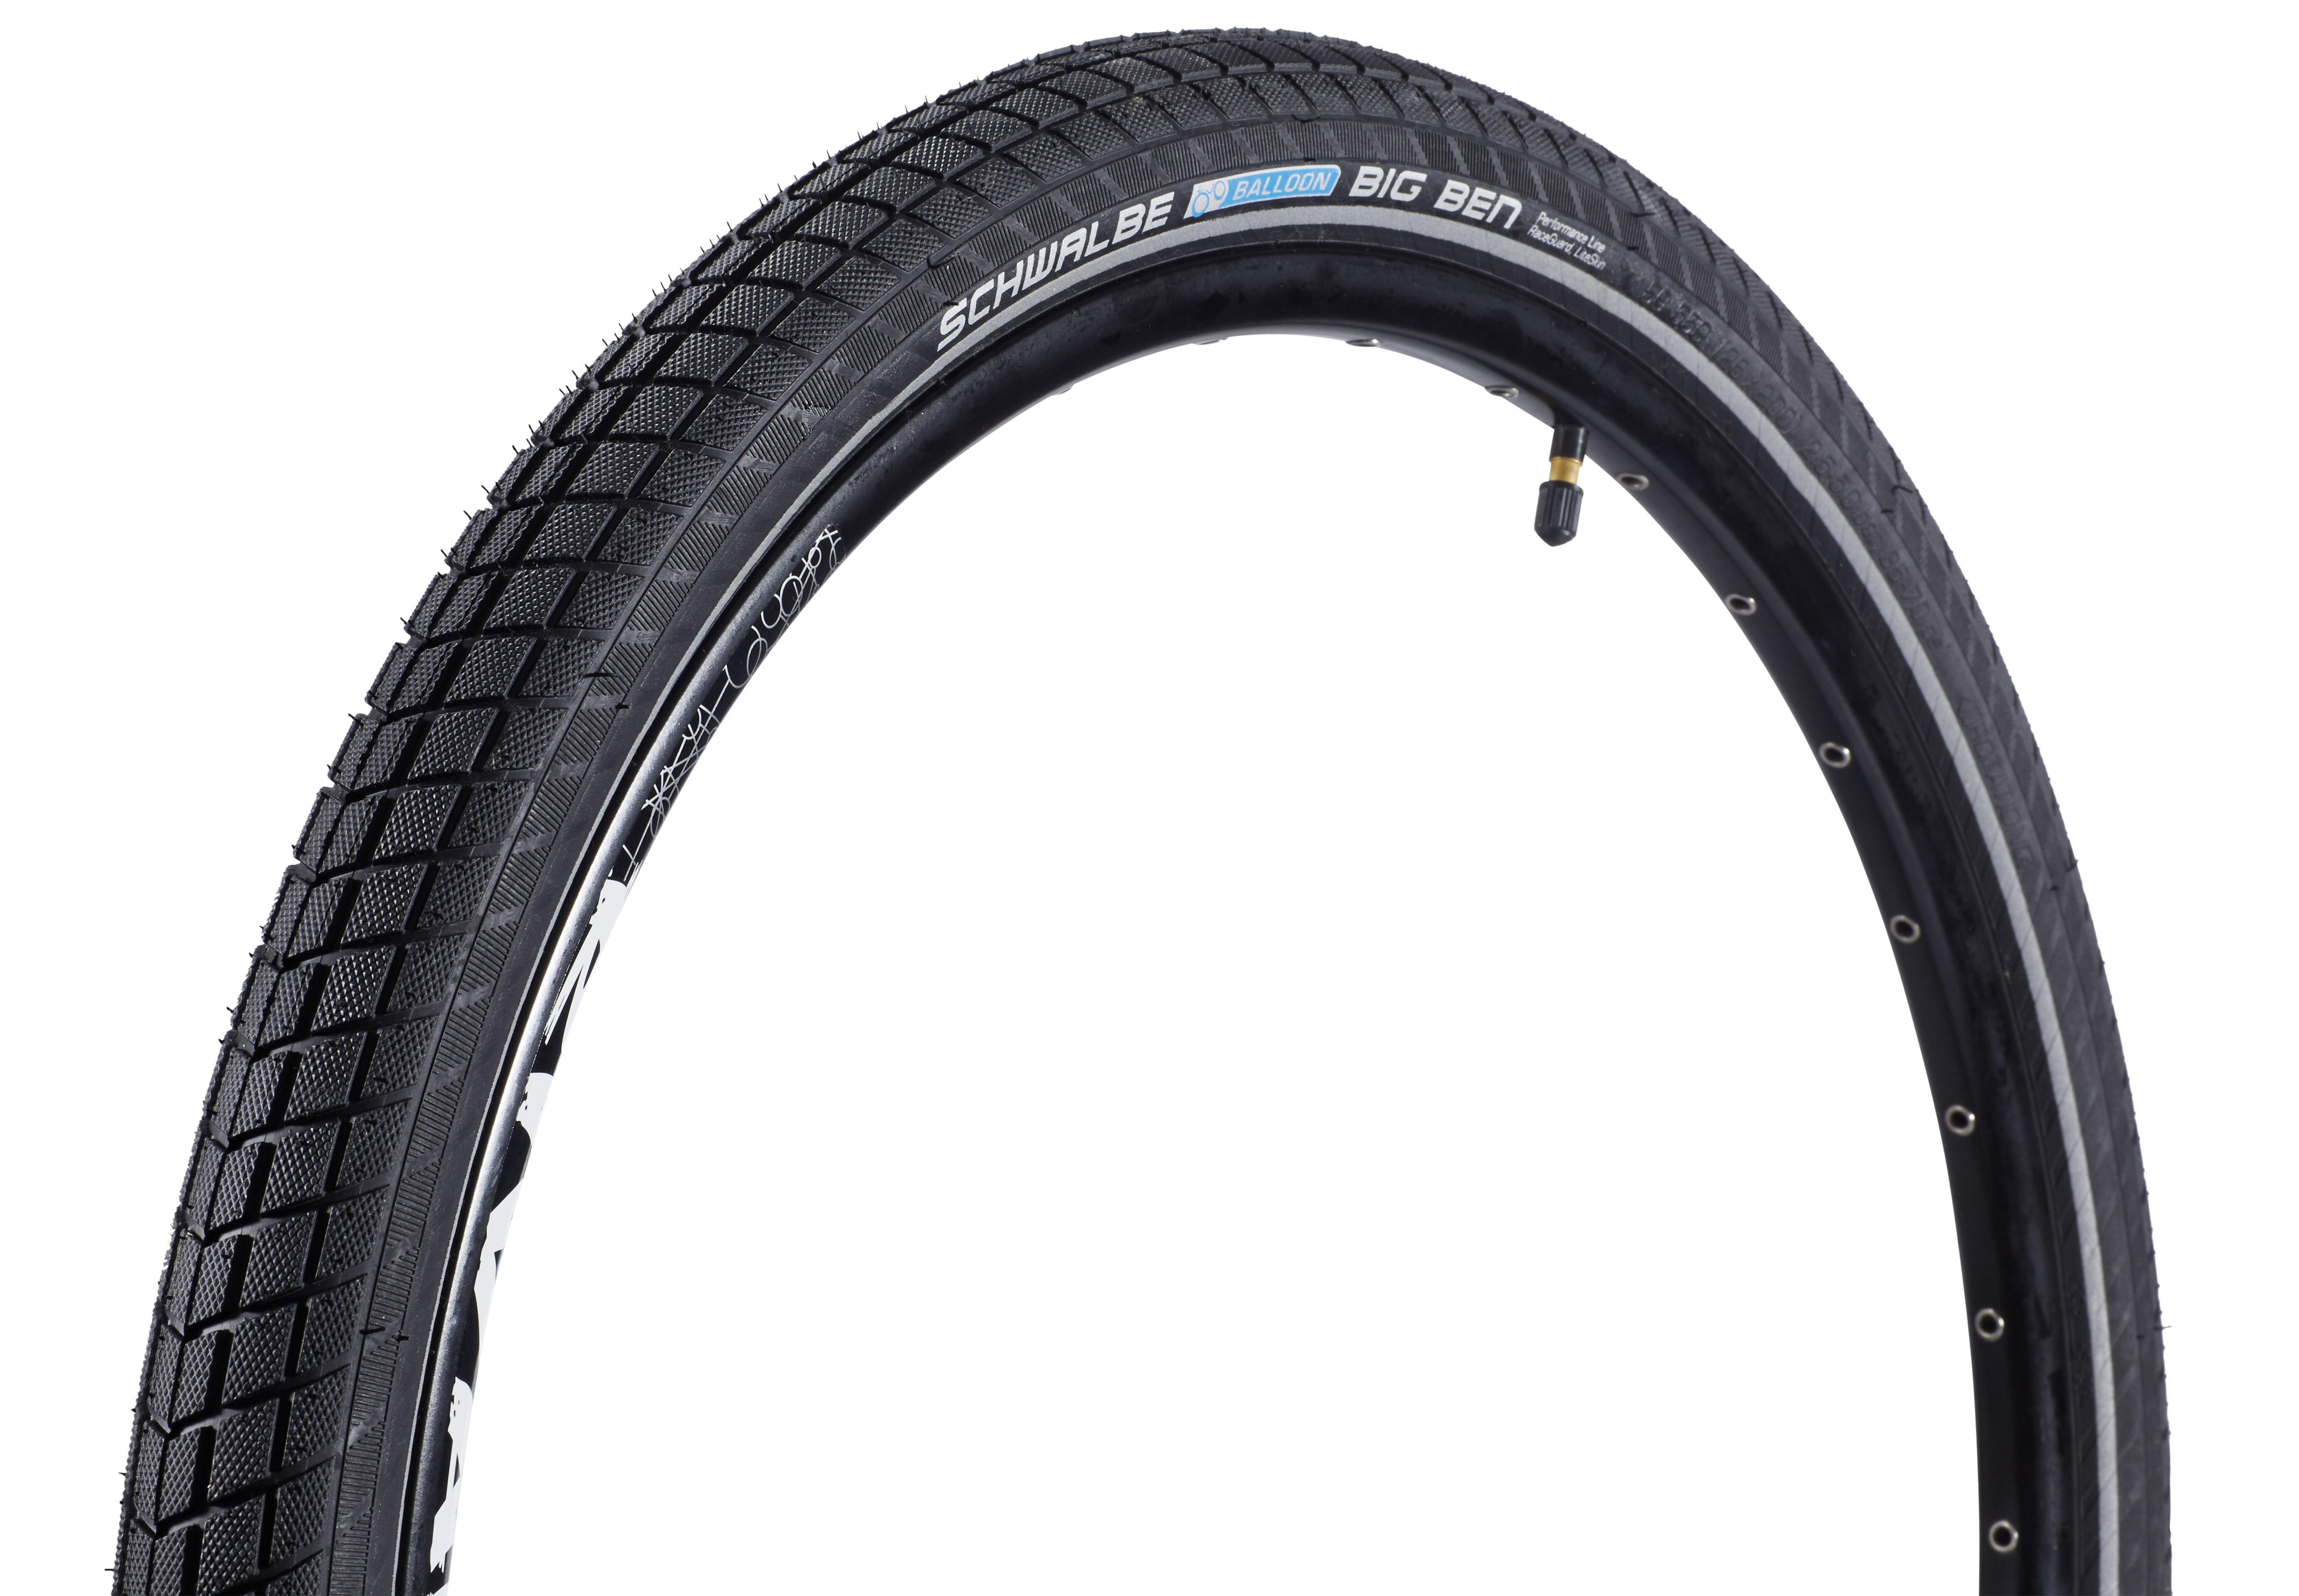 2 x Schwalbe Big Apple RaceGuard Wire Reflex Tyre 26 x 2,35 60-559 Black